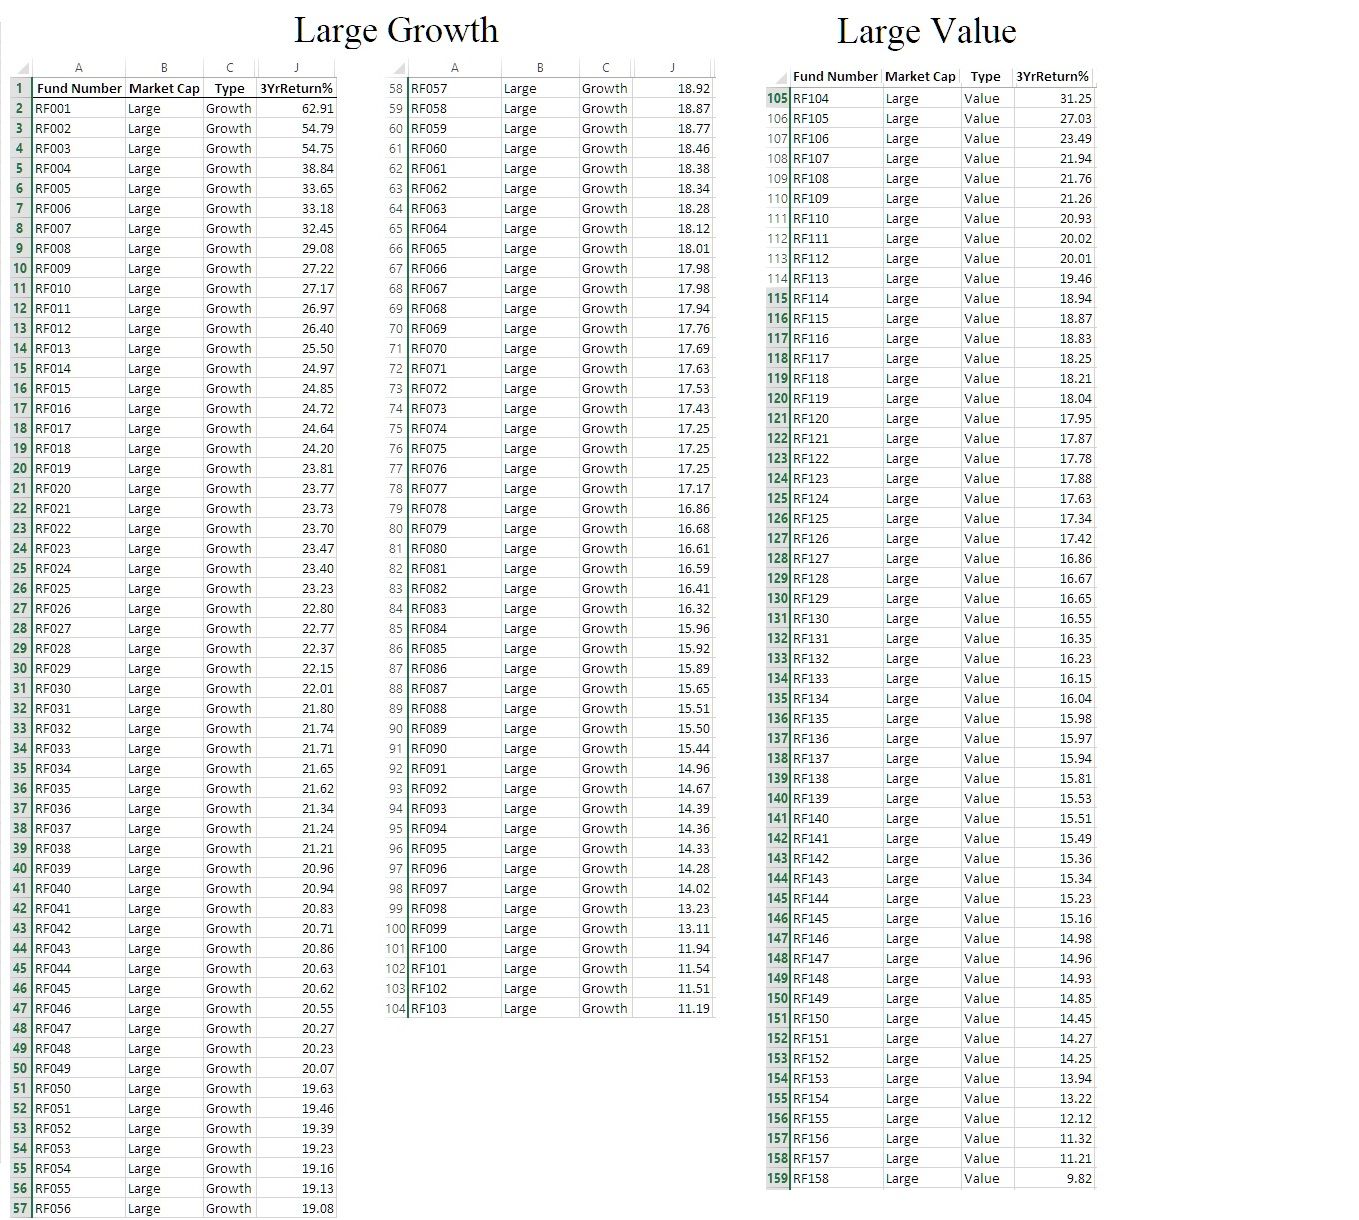 Large Growth Large Value В J A В C Fund Number Market Cap Type 3YrReturn% 1 Fund Number Market Cap Type 3YrReturn% 58 RF057 Growth Large 18.92 105 RF104 Value Large 31.25 59 RFO58 2 RF001 Growth Large Growth 62.91 Large 18.87 106 RF105 Value Large 27.03 54.79 3 RF002 60 RF059 Growth Growth 18.77 Large Large 107 RF106 Value Large 23.49 4 RF003 Growth 61 RF060 Growth Large 54.75 Large 18.46 108 RF107 Value Large 21.94 5 RF004 62 RF061 Growth 38.84 Growth Large Large 18.38 109 RF108 110 RF109 Value Large 21.76 6 RF005 7 RF006 Growth 63 RF062 Growth Large 33.65 Large 18.34 Value Large 21.26 64 RF063 Growth Growth 18.28 Large 33.18 Large 111 RF110 Value Large 20.93 8 RF007 9 RF008 Growth Growth 65 RF064 18.12 Large 32.45 Large 112 RF111 Value Large 20.02 66 RF065 Growth Growth Large 29.08 Large 18.01 113 RF112 Value 20.01 Large 10 RF009 Growth 67 RF066 Growth Large 27.22 Large 17.98 114 RF113 Value Large 19.46 11 RF010 68 RF067 Growth 27.17 Growth 17.98 Large Large 115 RF114 Value Large 18.94 Growth Growth 12 RF011 69 RF068 Large 26.97 Large 17.94 116 RF115 Value Large 18.87 13 RF012 70 RF069 Growth Growth 17.76 Large 26.40 Large 117 RF116 Value 18.83 Large 71 RF070 14 RF013 15 RF014 Growth Growth Large 25.50 Large 17.69 118 RF117 Value Large 18.25 Growth 72 RF071 Growth 17.63 Large 24.97 Large 119 RF118 Value Large 18.21 16 RF015 17 RF016 73 RF072 Growth Growth 17.53 Large 24.85 Large 120 RF119 Value Large 18.04 Growth 24.72 74 RF073 Growth 17.43 Large Large 121 RF120 Value 17.95 Large 18 RF017 Growth 75 RF074 Growth Large 24.64 Large 17.25 122 RF121 Value Large 17.87 19 RF018 76 RF075 Growth Growth 17.25 Large 24.20 Large 123 RF122 124 RF123 125 RF124 Value Large 17.78 20 RF019 Growth 77 RF076 Growth 17.25 Large 23.81 Large Value 17.88 Large 21 RF020 78 RF077 Growth Growth Large 23.77 Large 17.17 Value Large 17.63 22 RF021 79 RF078 Growth Growth Large 23.73 Large 16.86 126 RF125 Value Large 17.34 23 RF022 24 RF023 Growth 80 RF079 Large Growth 23.70 Large 16.68 127 RF12